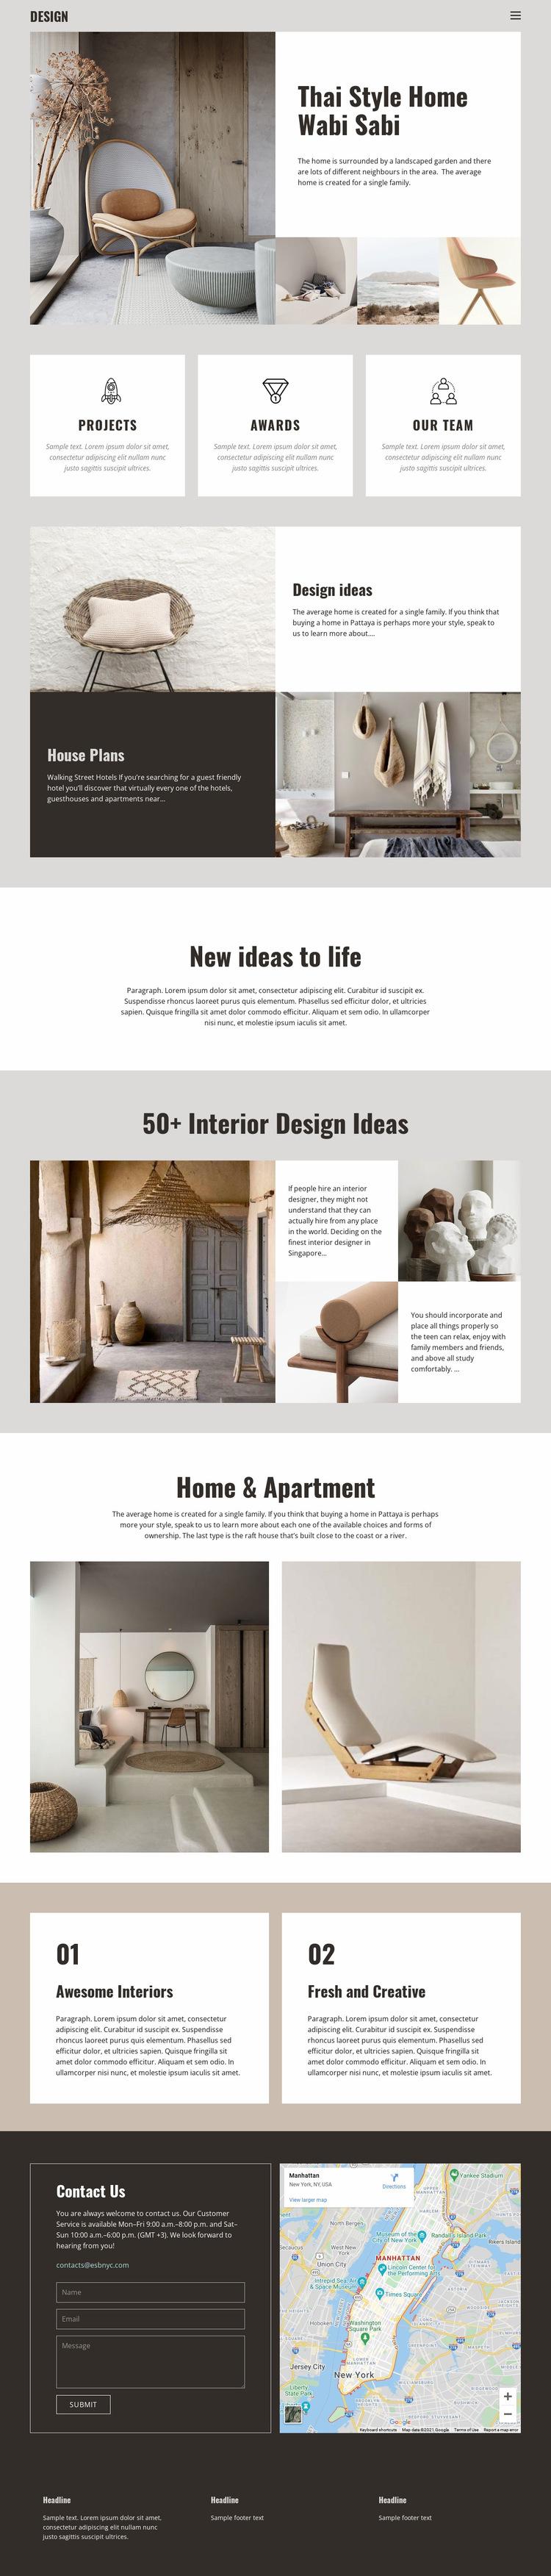 Thai style for home design Website Builder